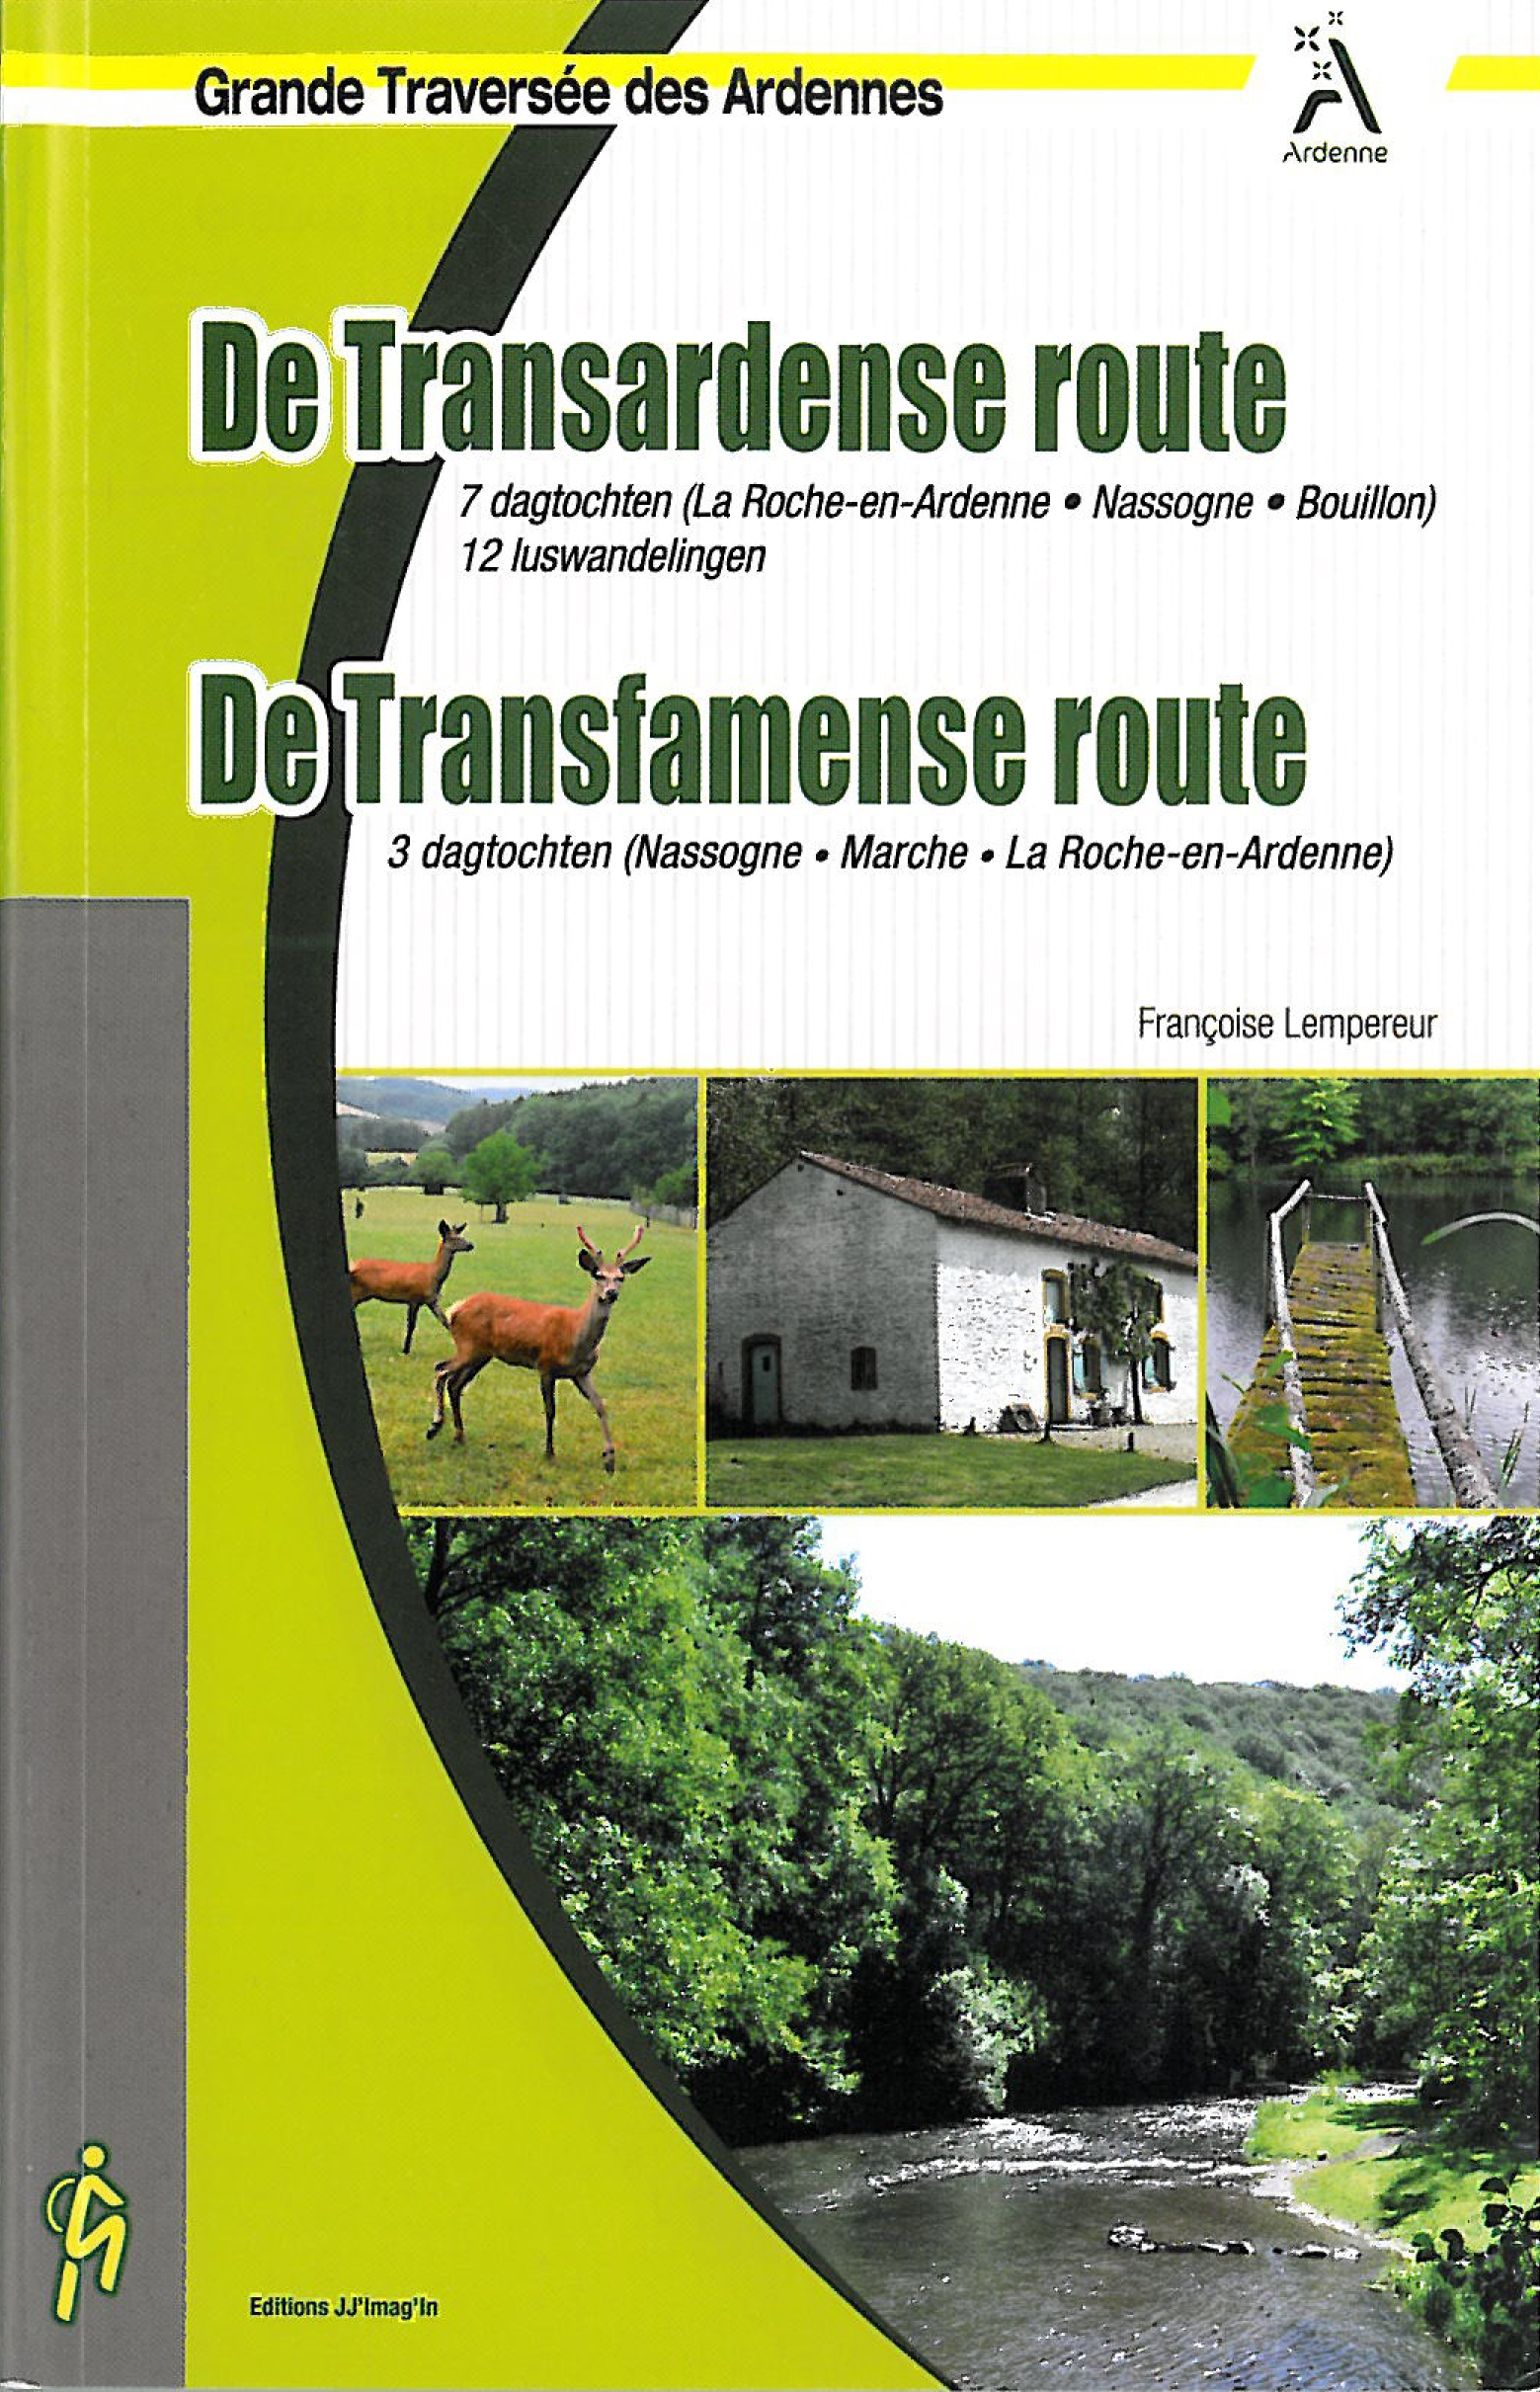 Wandelgids De Transardense Route (Ardennen)   JJ'Imag'In